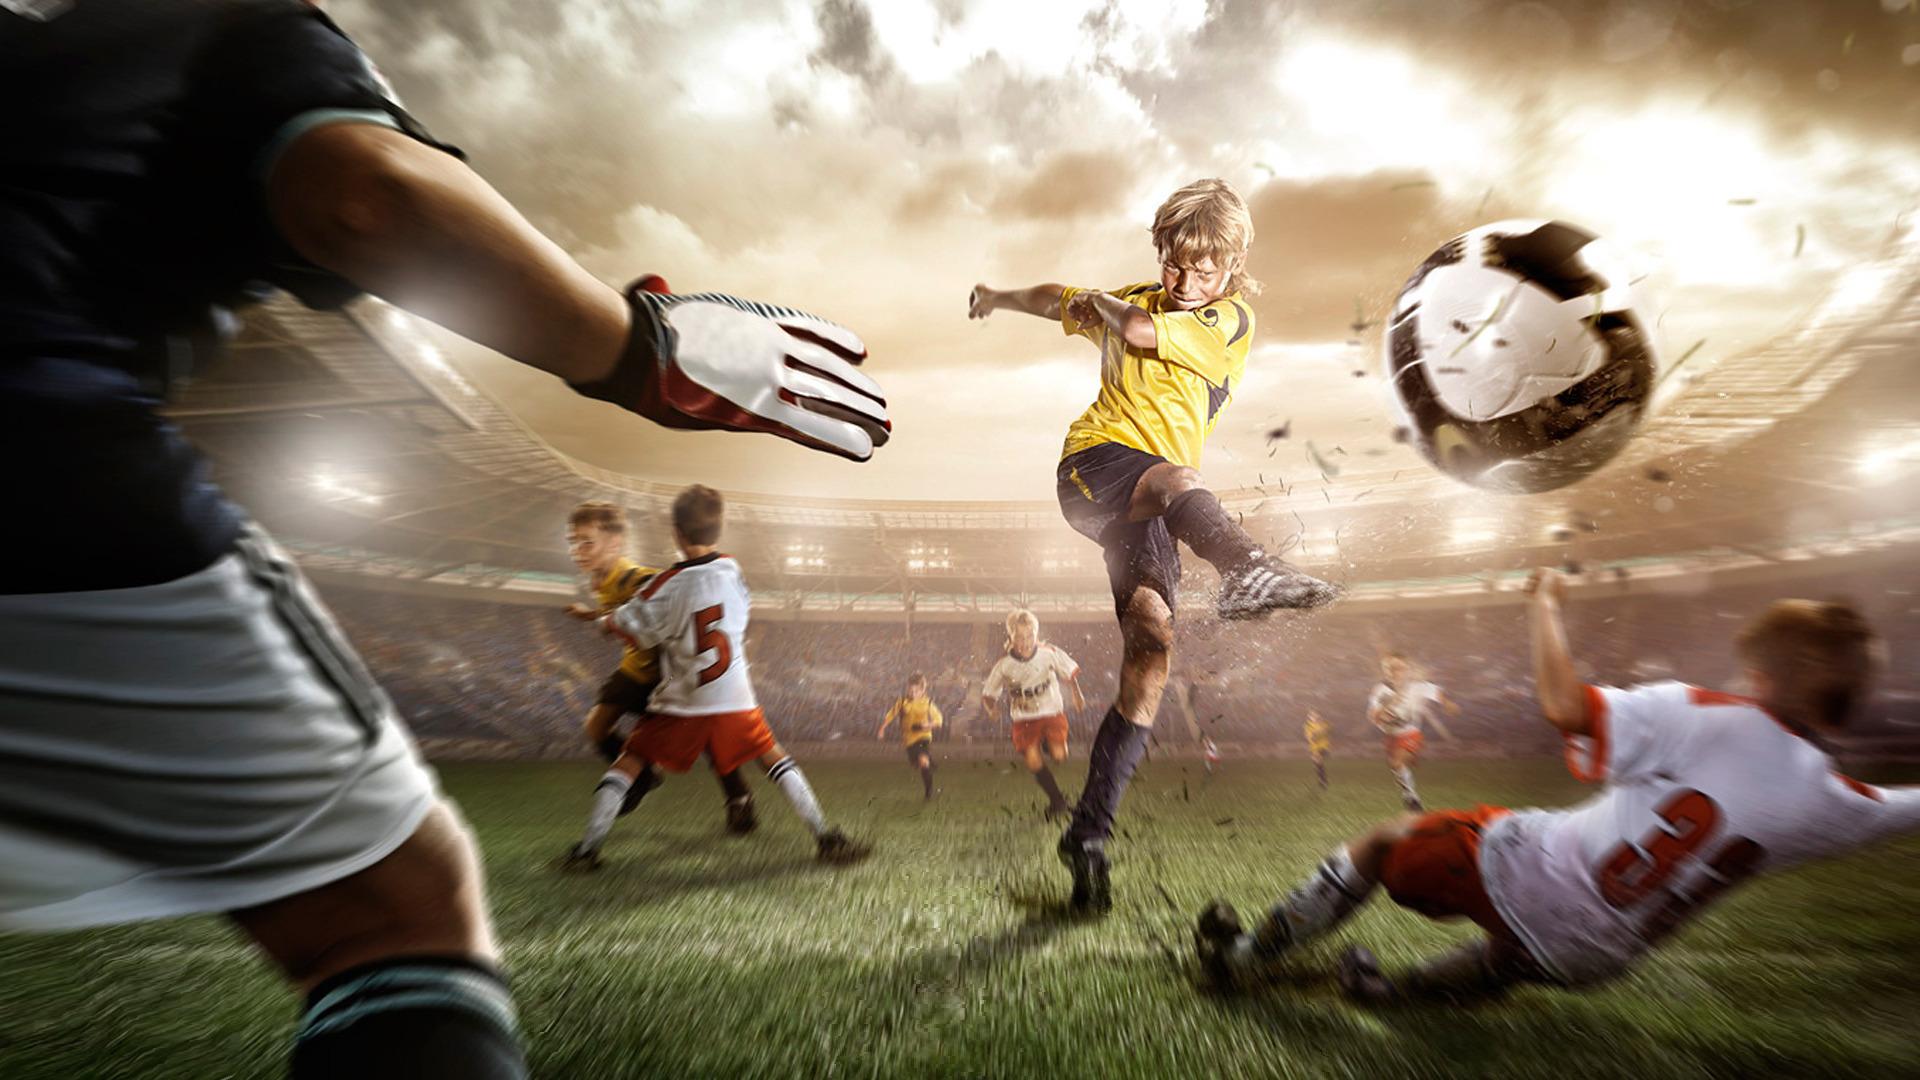 Картинки в движении футбол